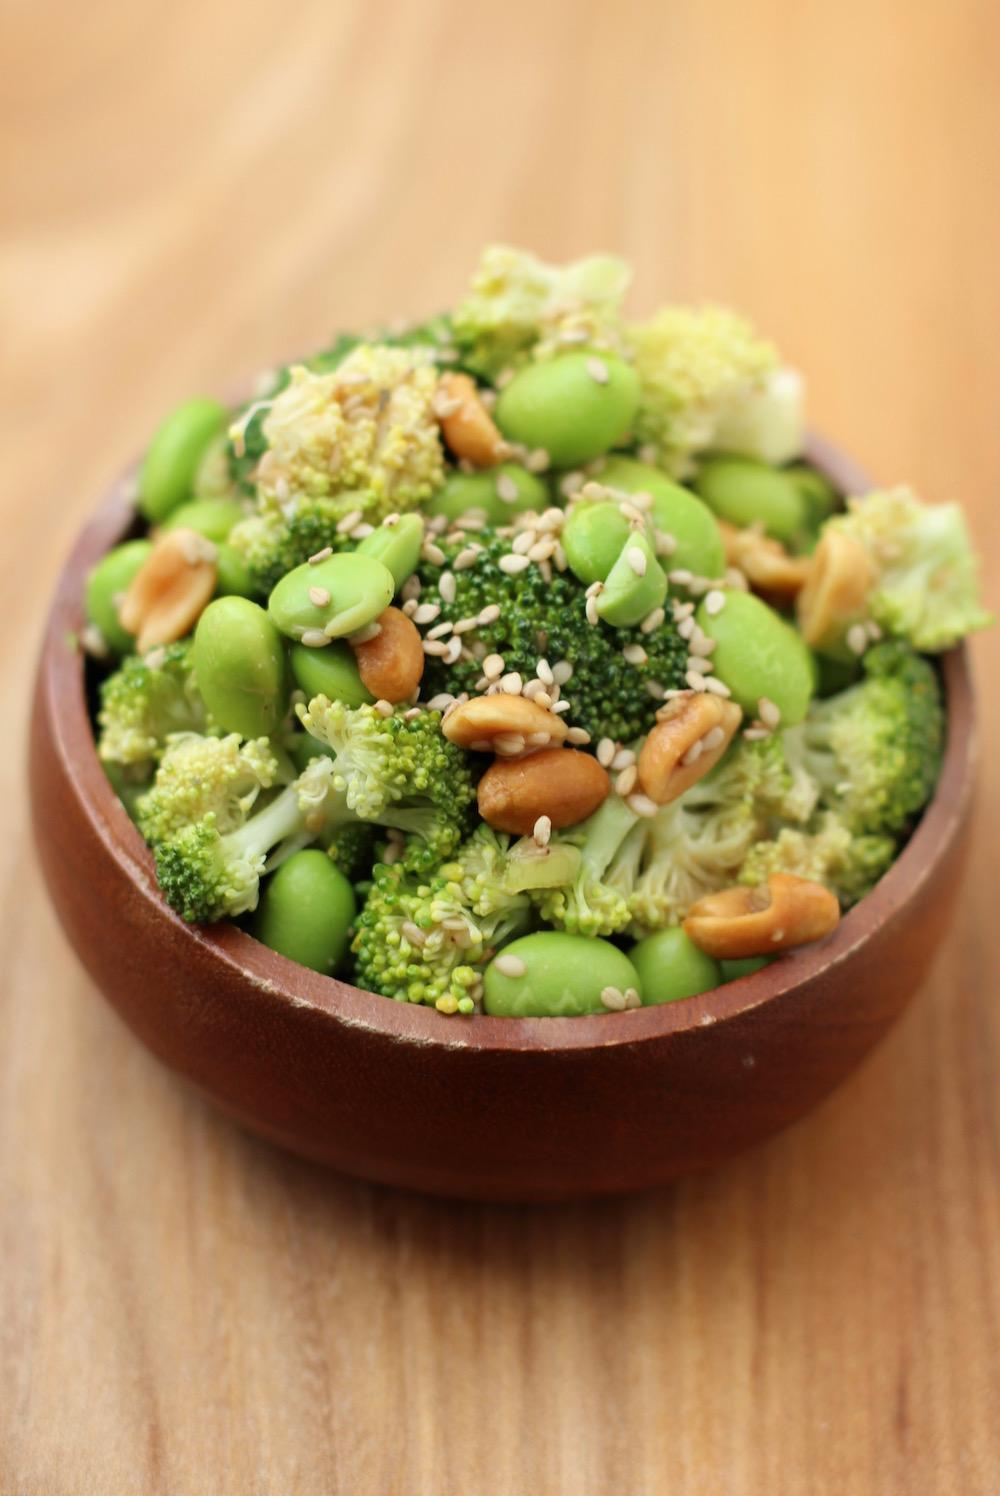 Broccoli salat med peanuts